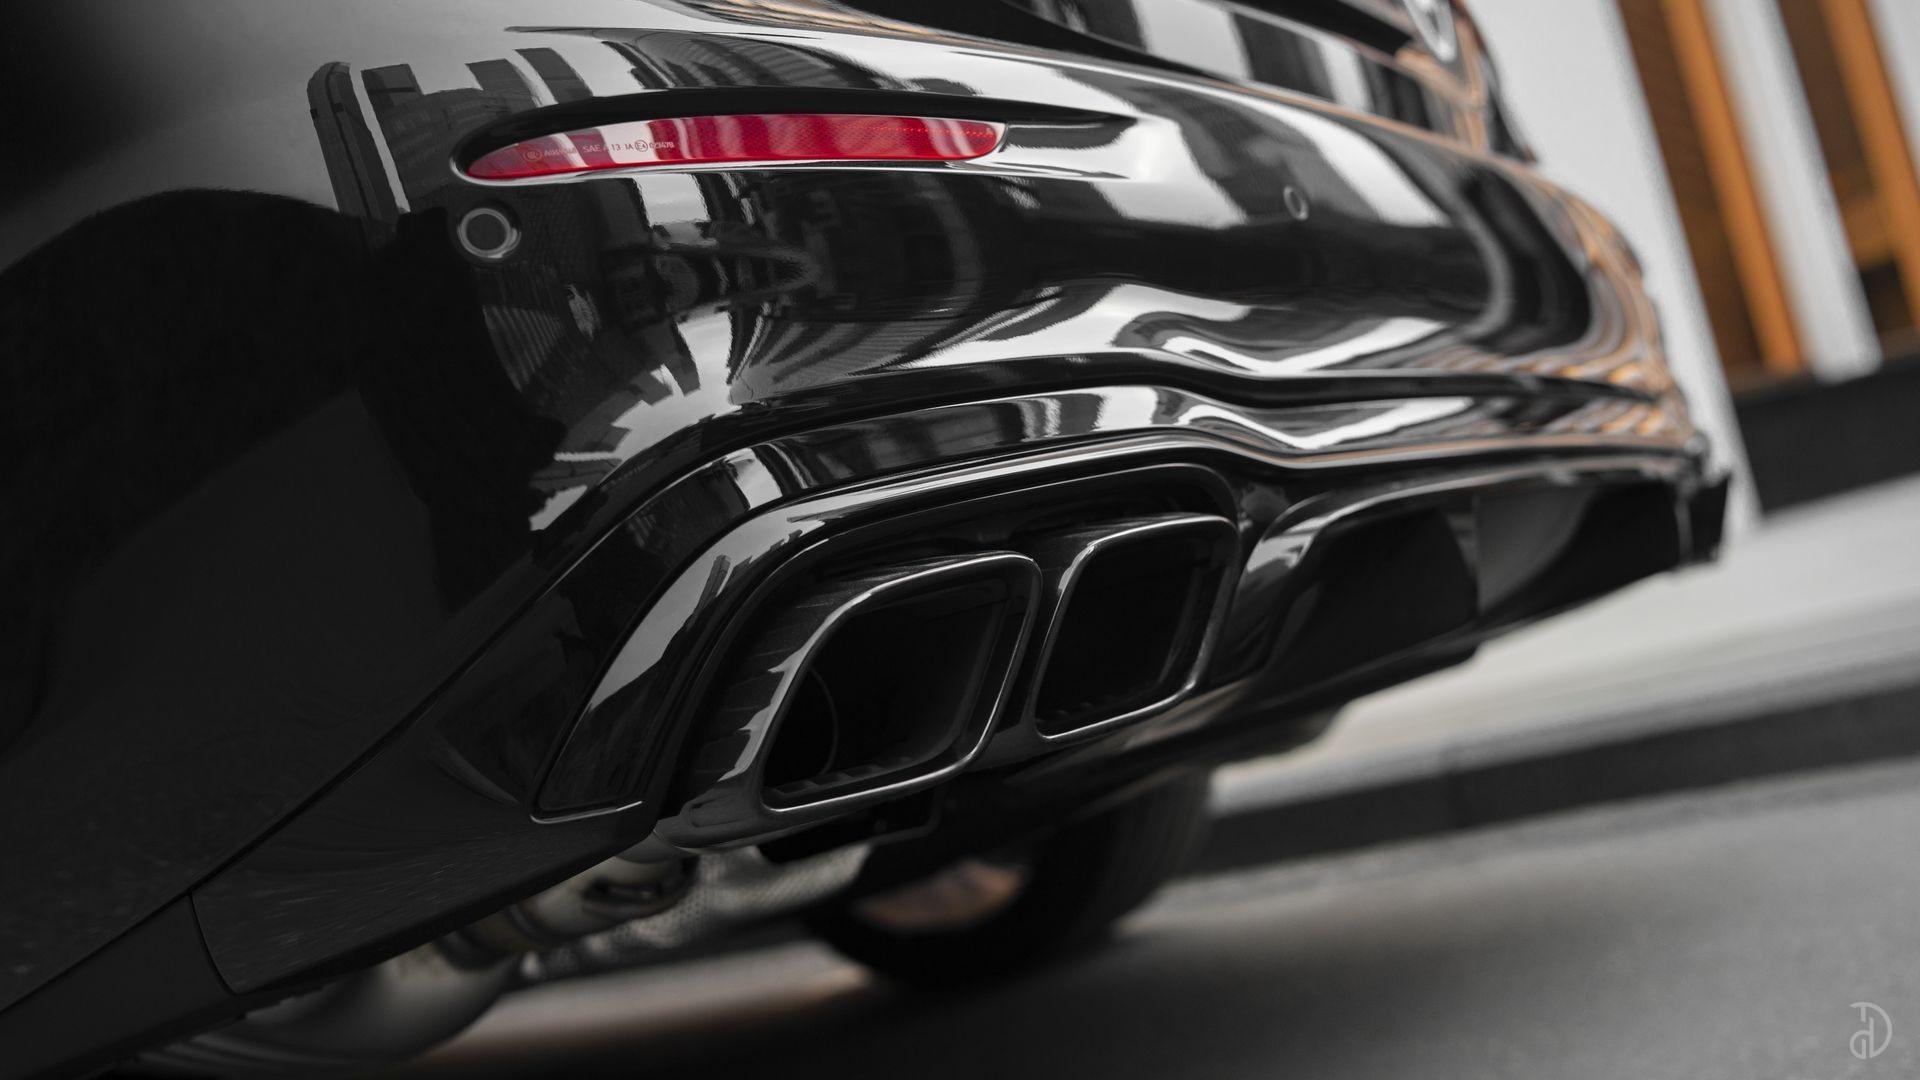 Аренда Mercedes Benz E 63 Amg S 2020 в Москве. Фото 12